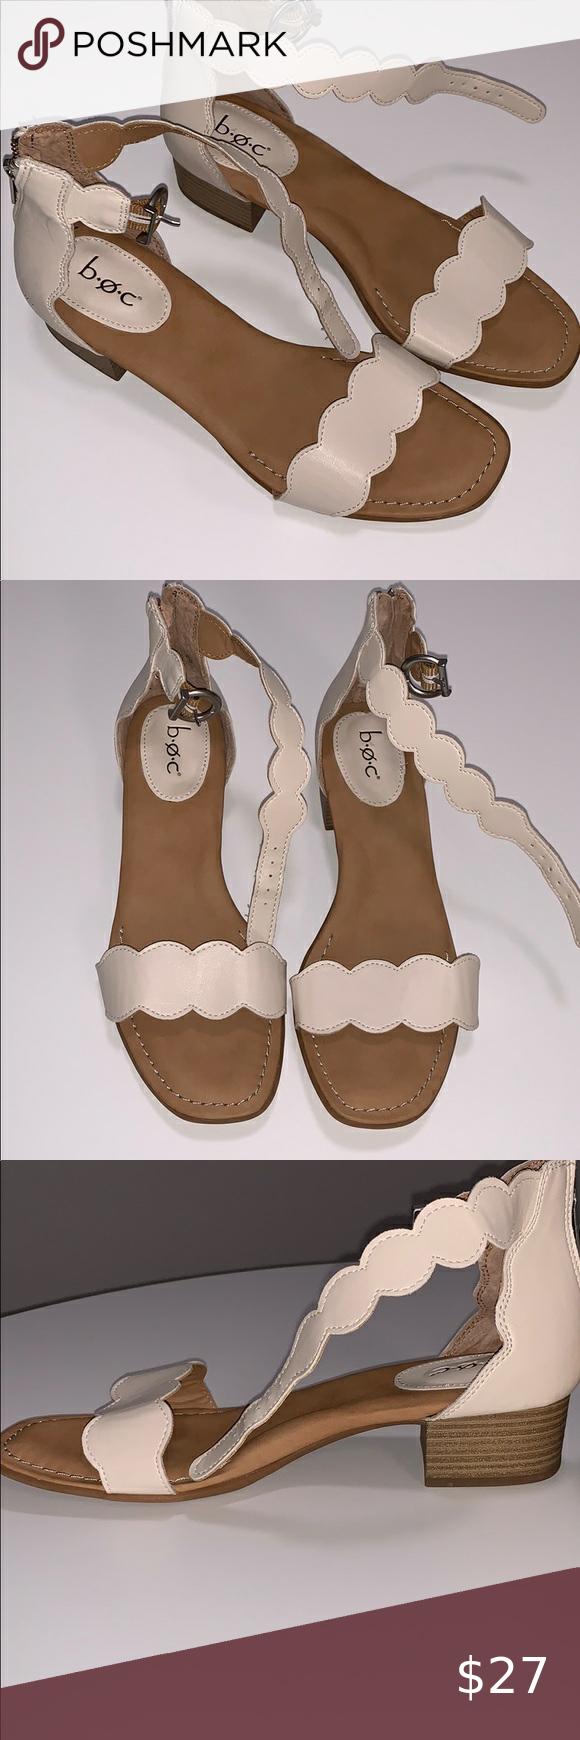 B.O.C. 'Holly' Block Heel Sandals - 8